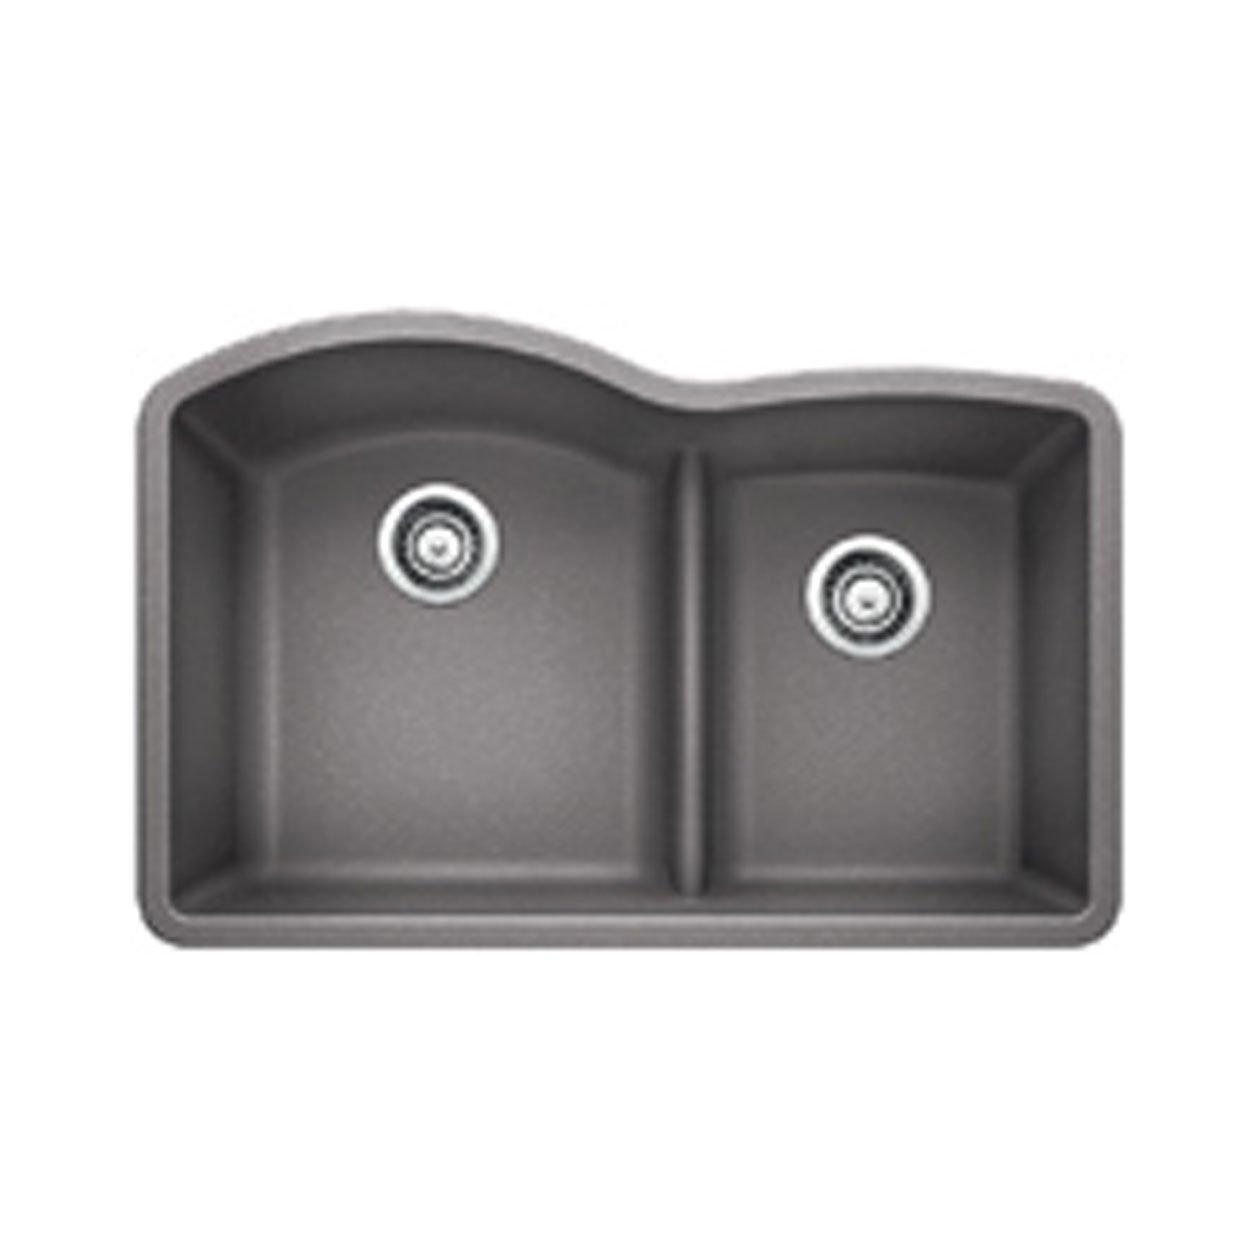 Blanco 441592 Diamond 1.75 Low Divide Under Mount Double Bowl Kitchen Sink, Large, Metallic Gray